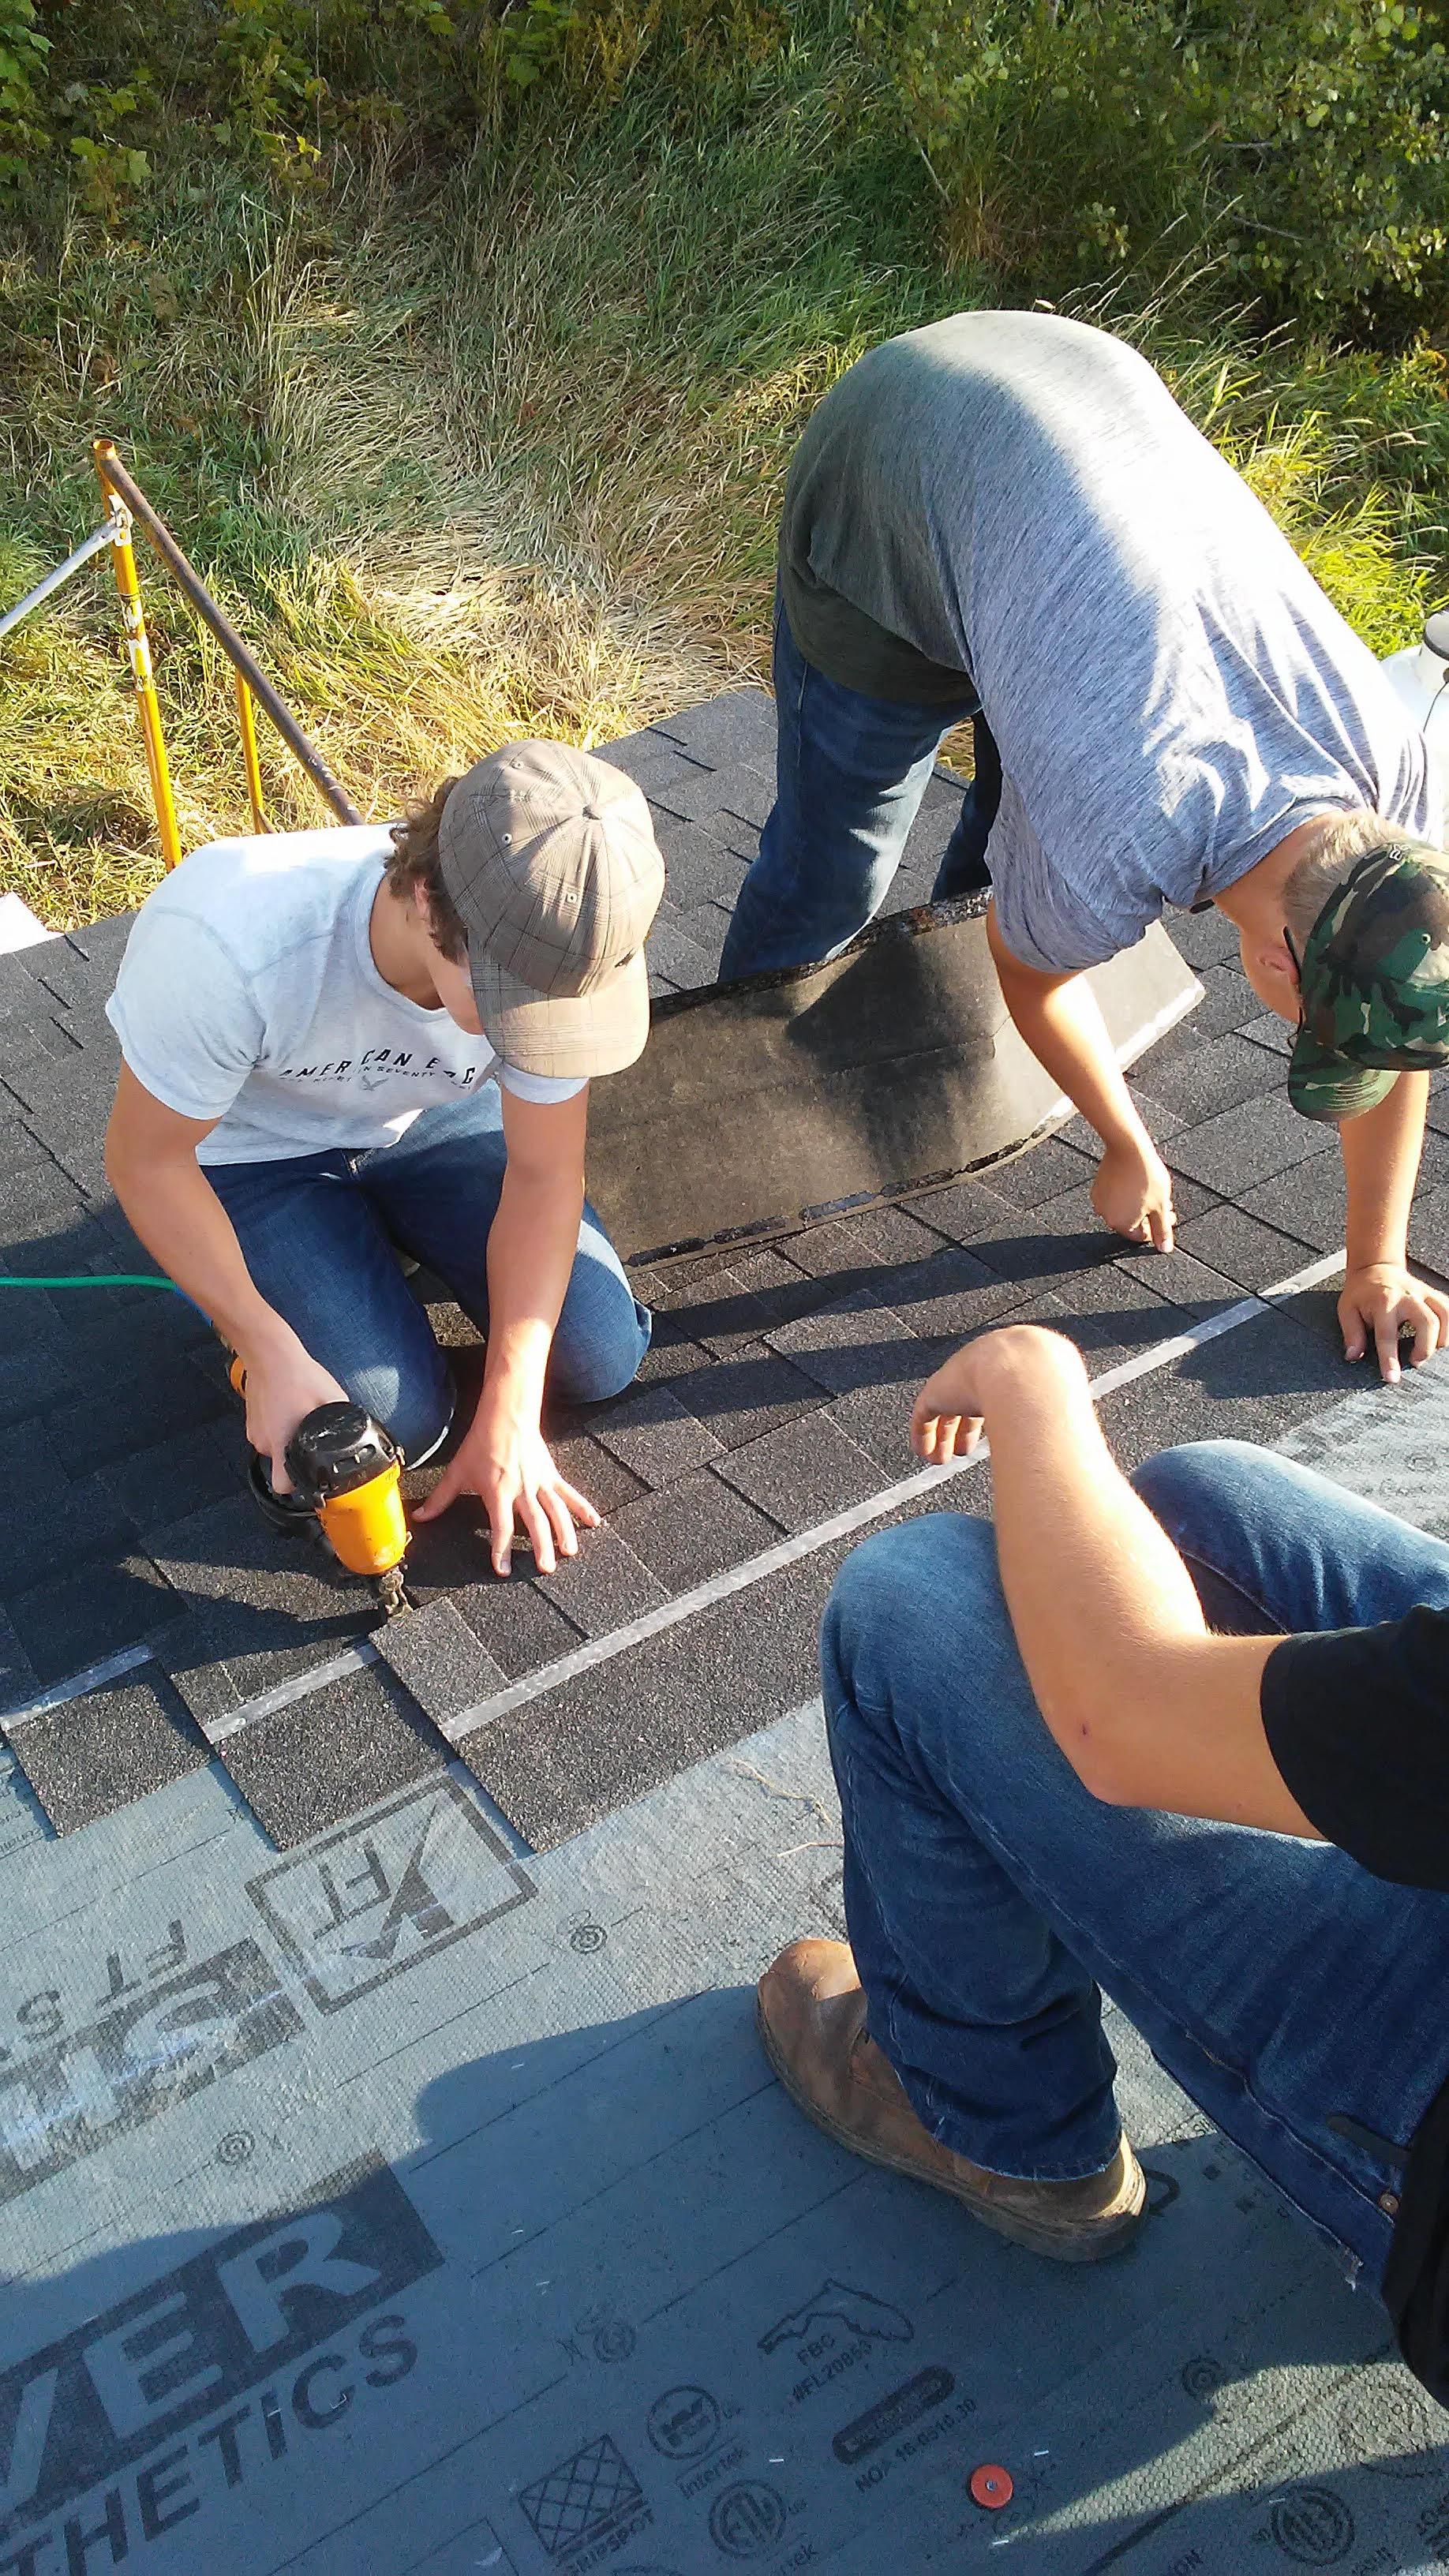 Roofing shingle installation